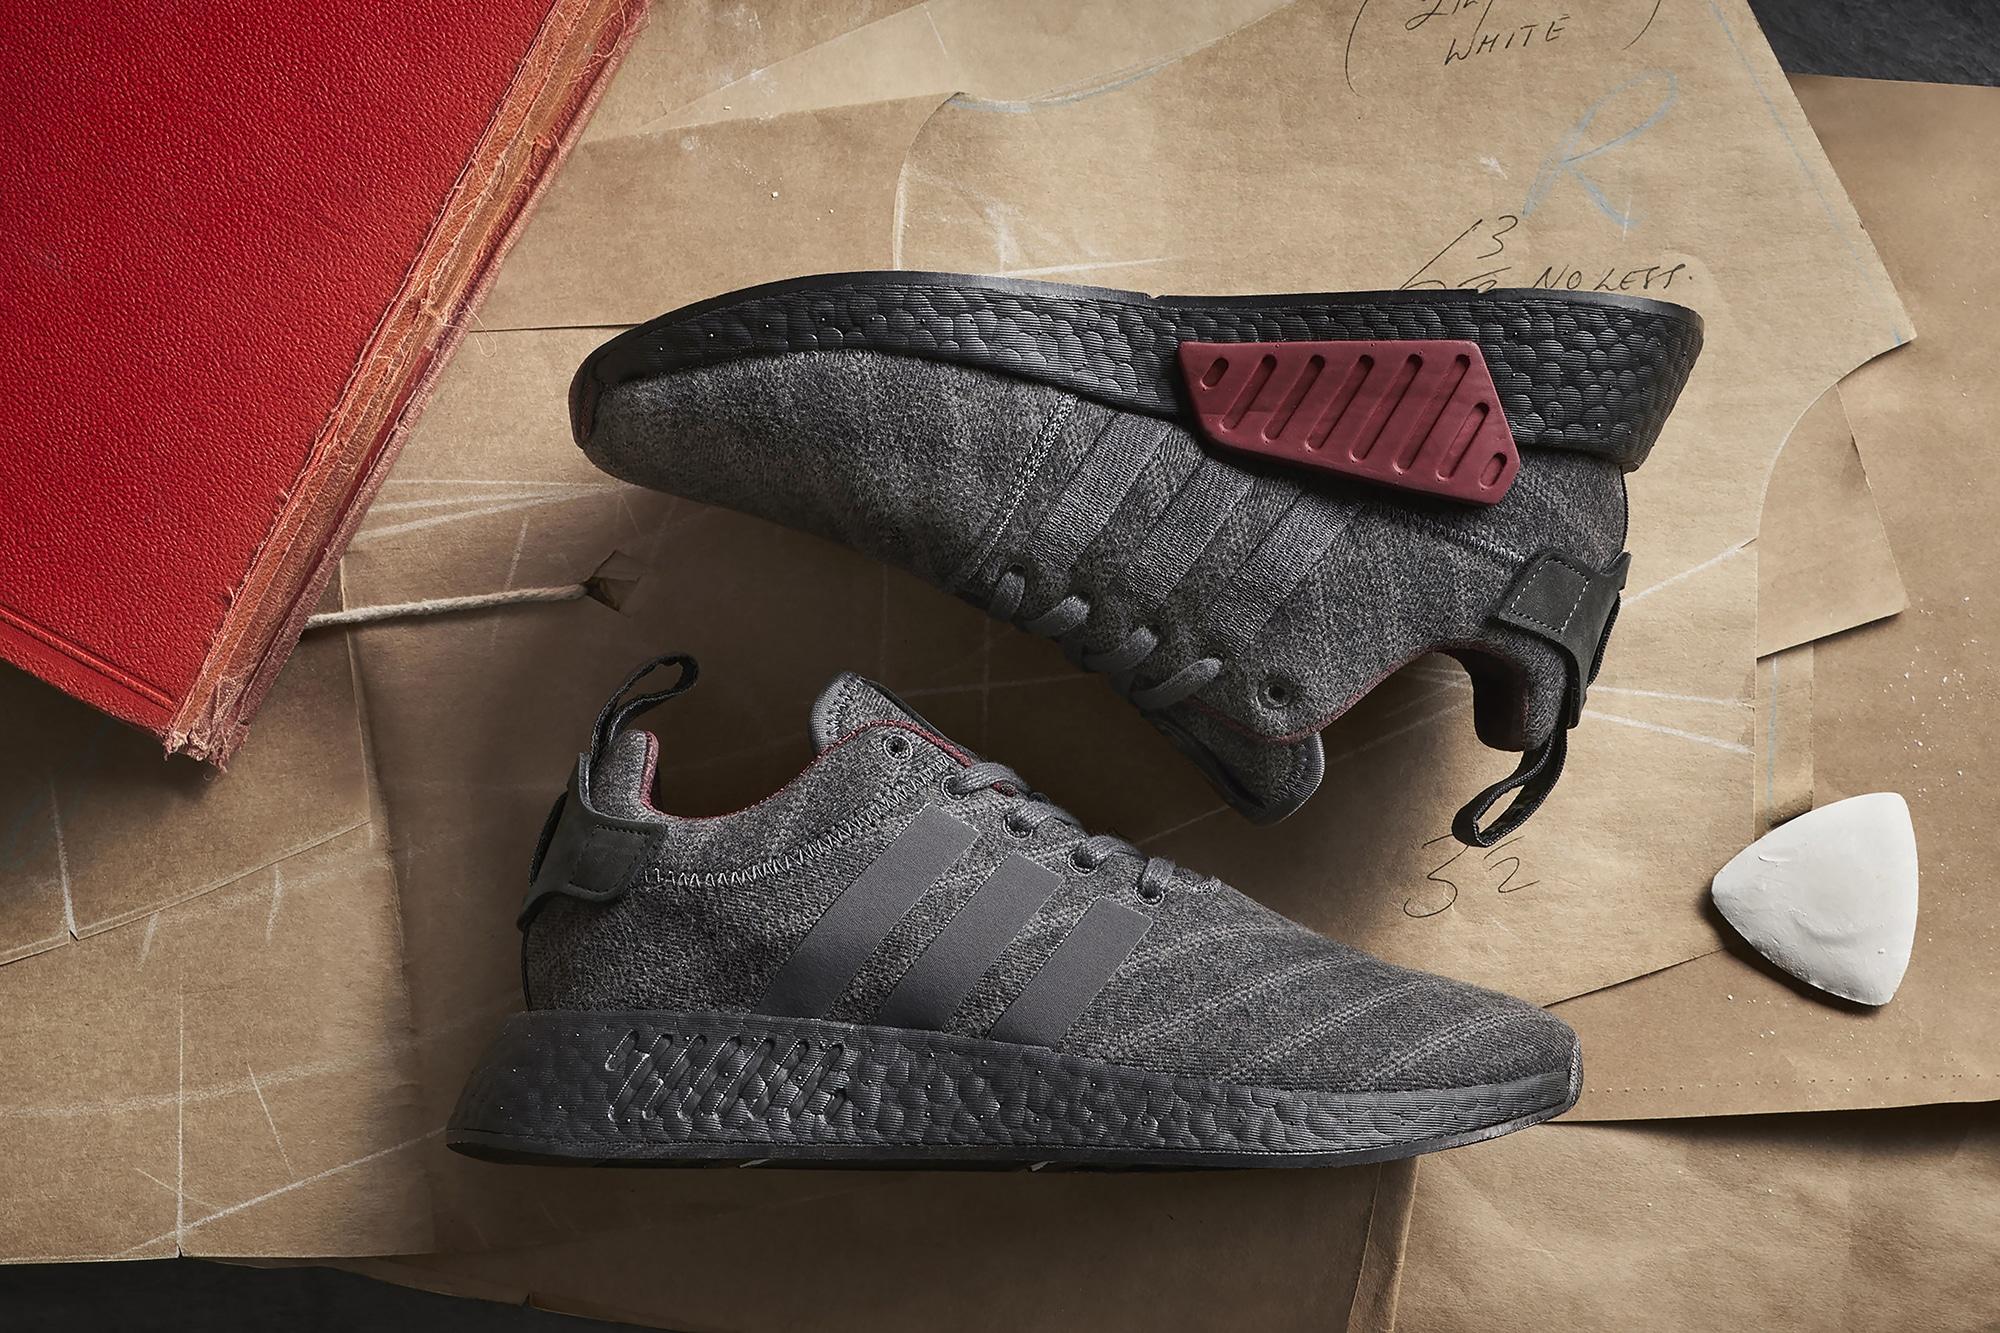 Adidas x Size x Henry Poole